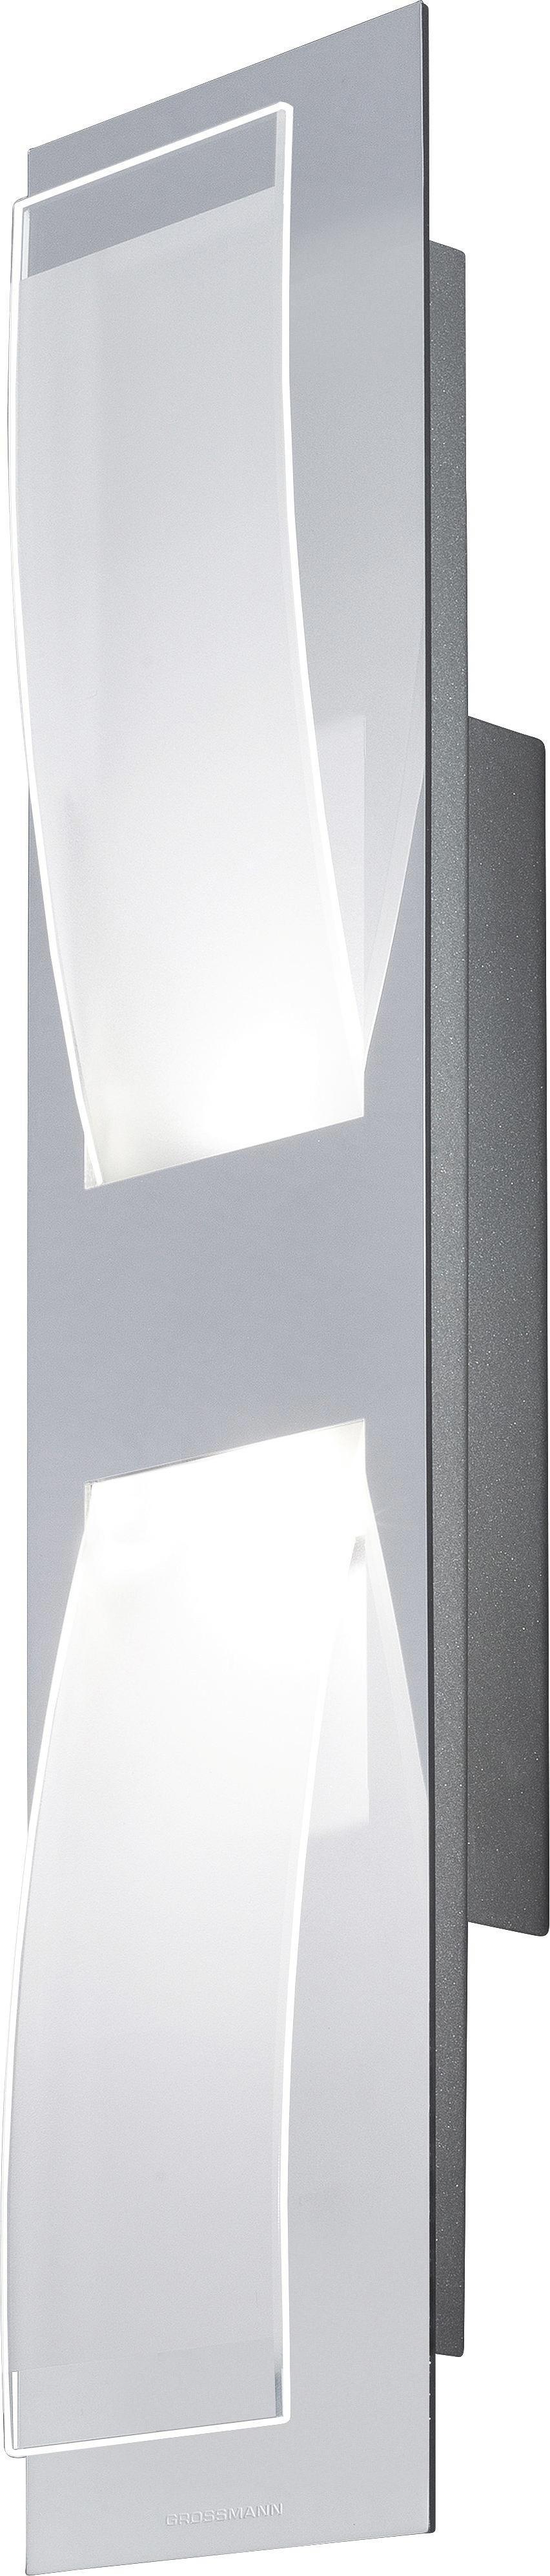 WANDLEUCHTE - LIFESTYLE, Glas/Metall (45/10/8cm)